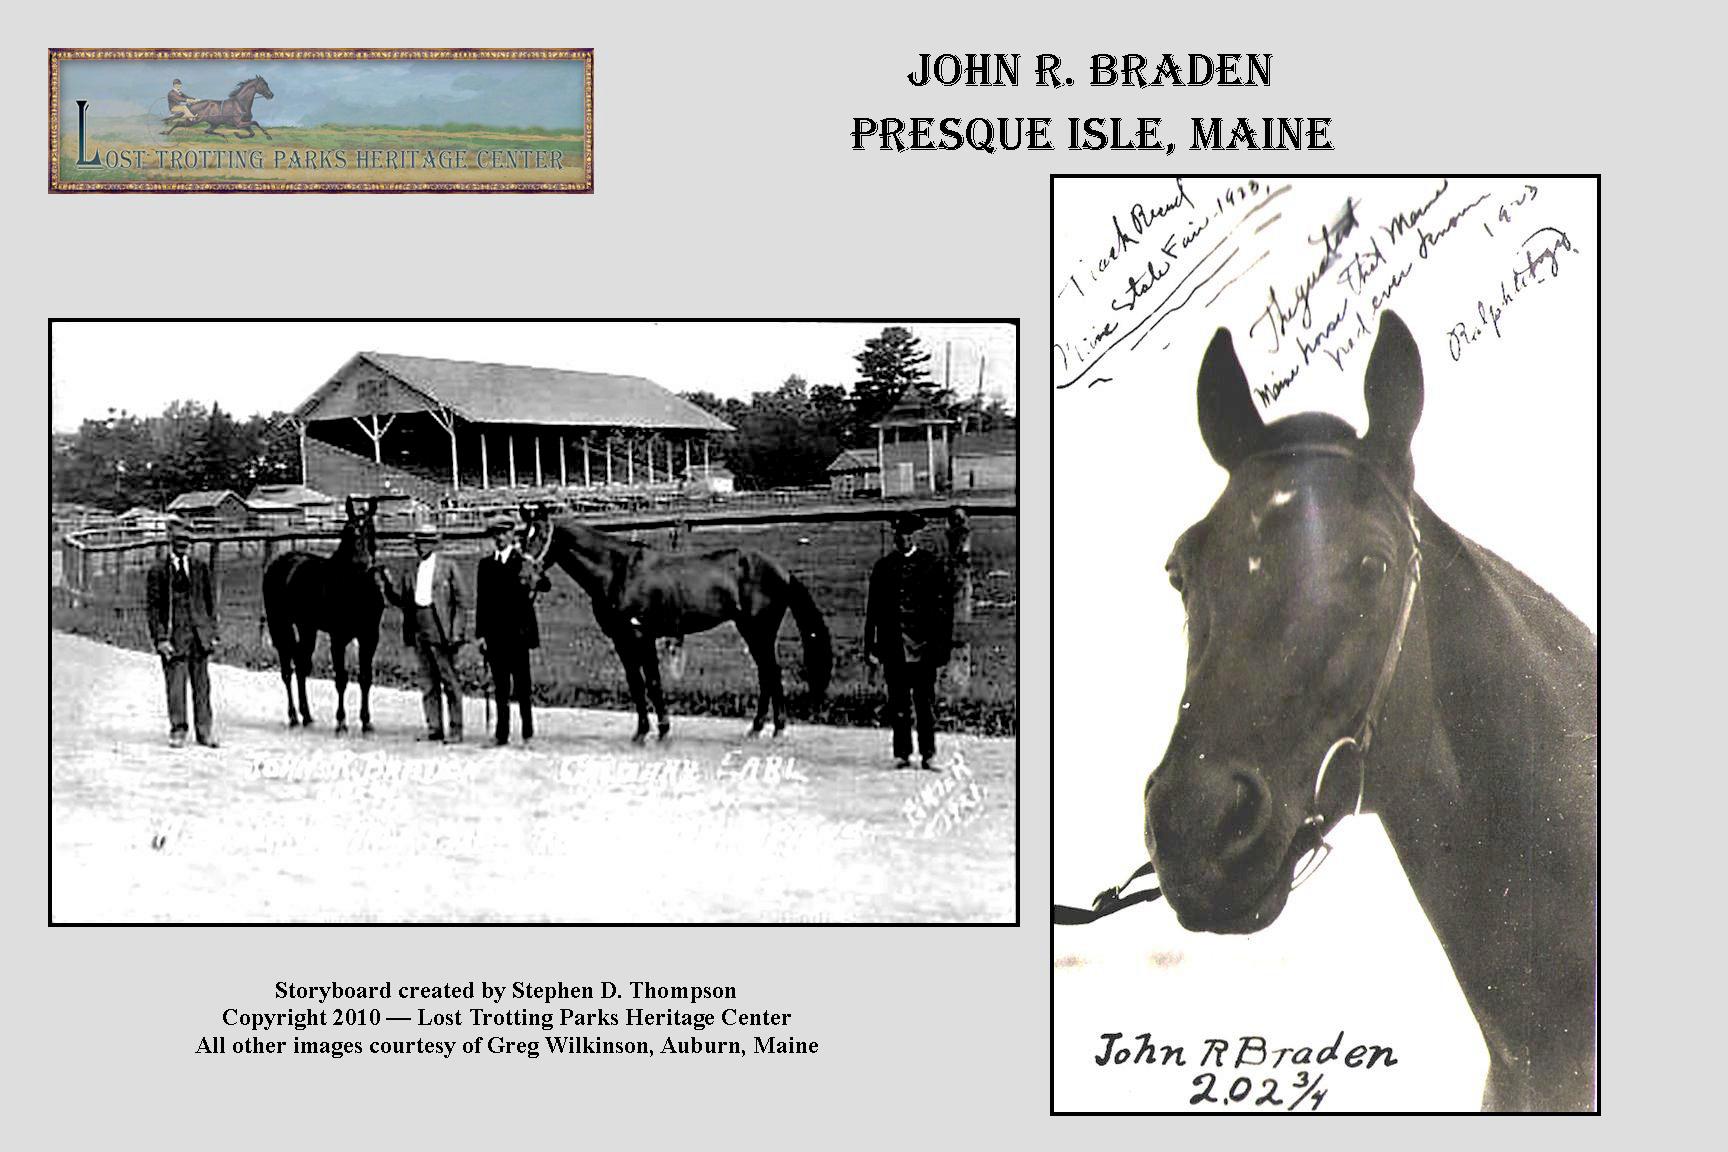 S. Dexter's Maine Spirit of the Turf — Single G Defeats John R Braden (1925) The Ghostlly Railbirds of Beacon Park